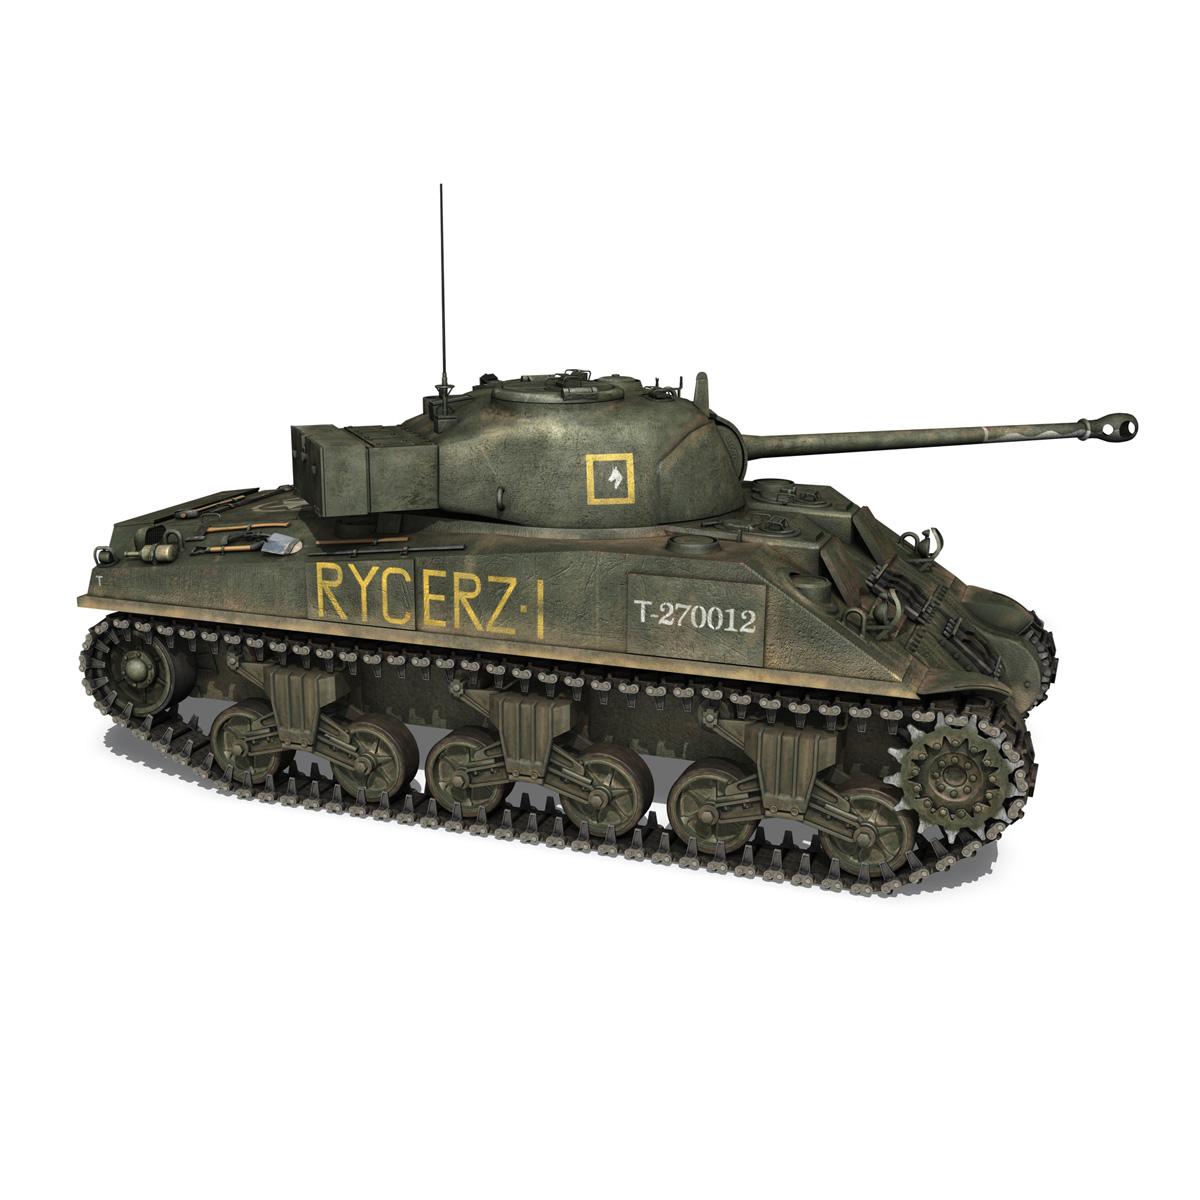 sherman mk vc firefly - rycerz i 3d modelis 3ds fbx c4d lwo obj 273075